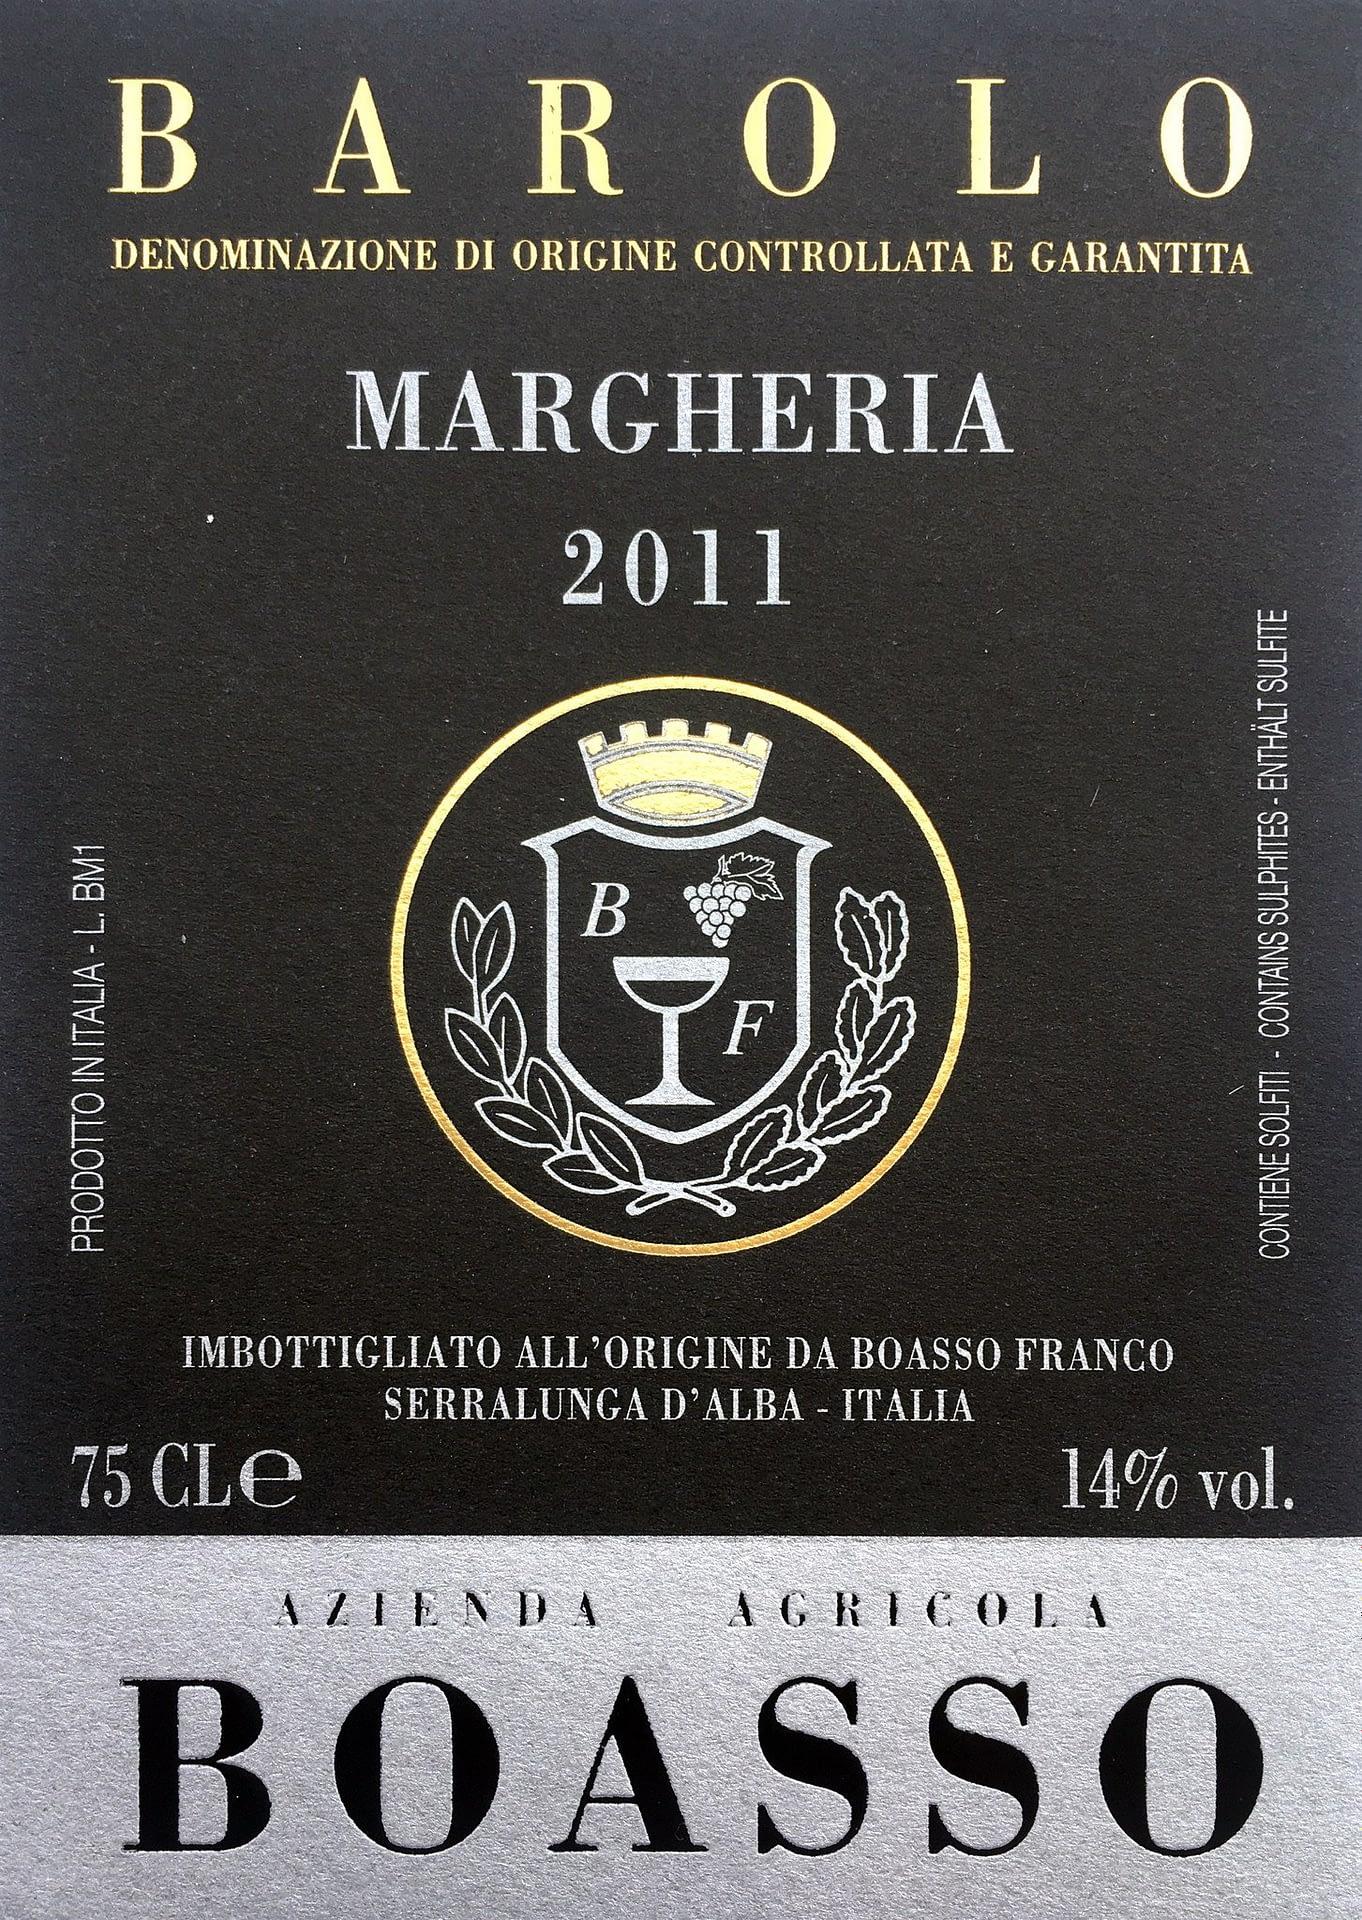 Boasso Barolo Margheria 2012